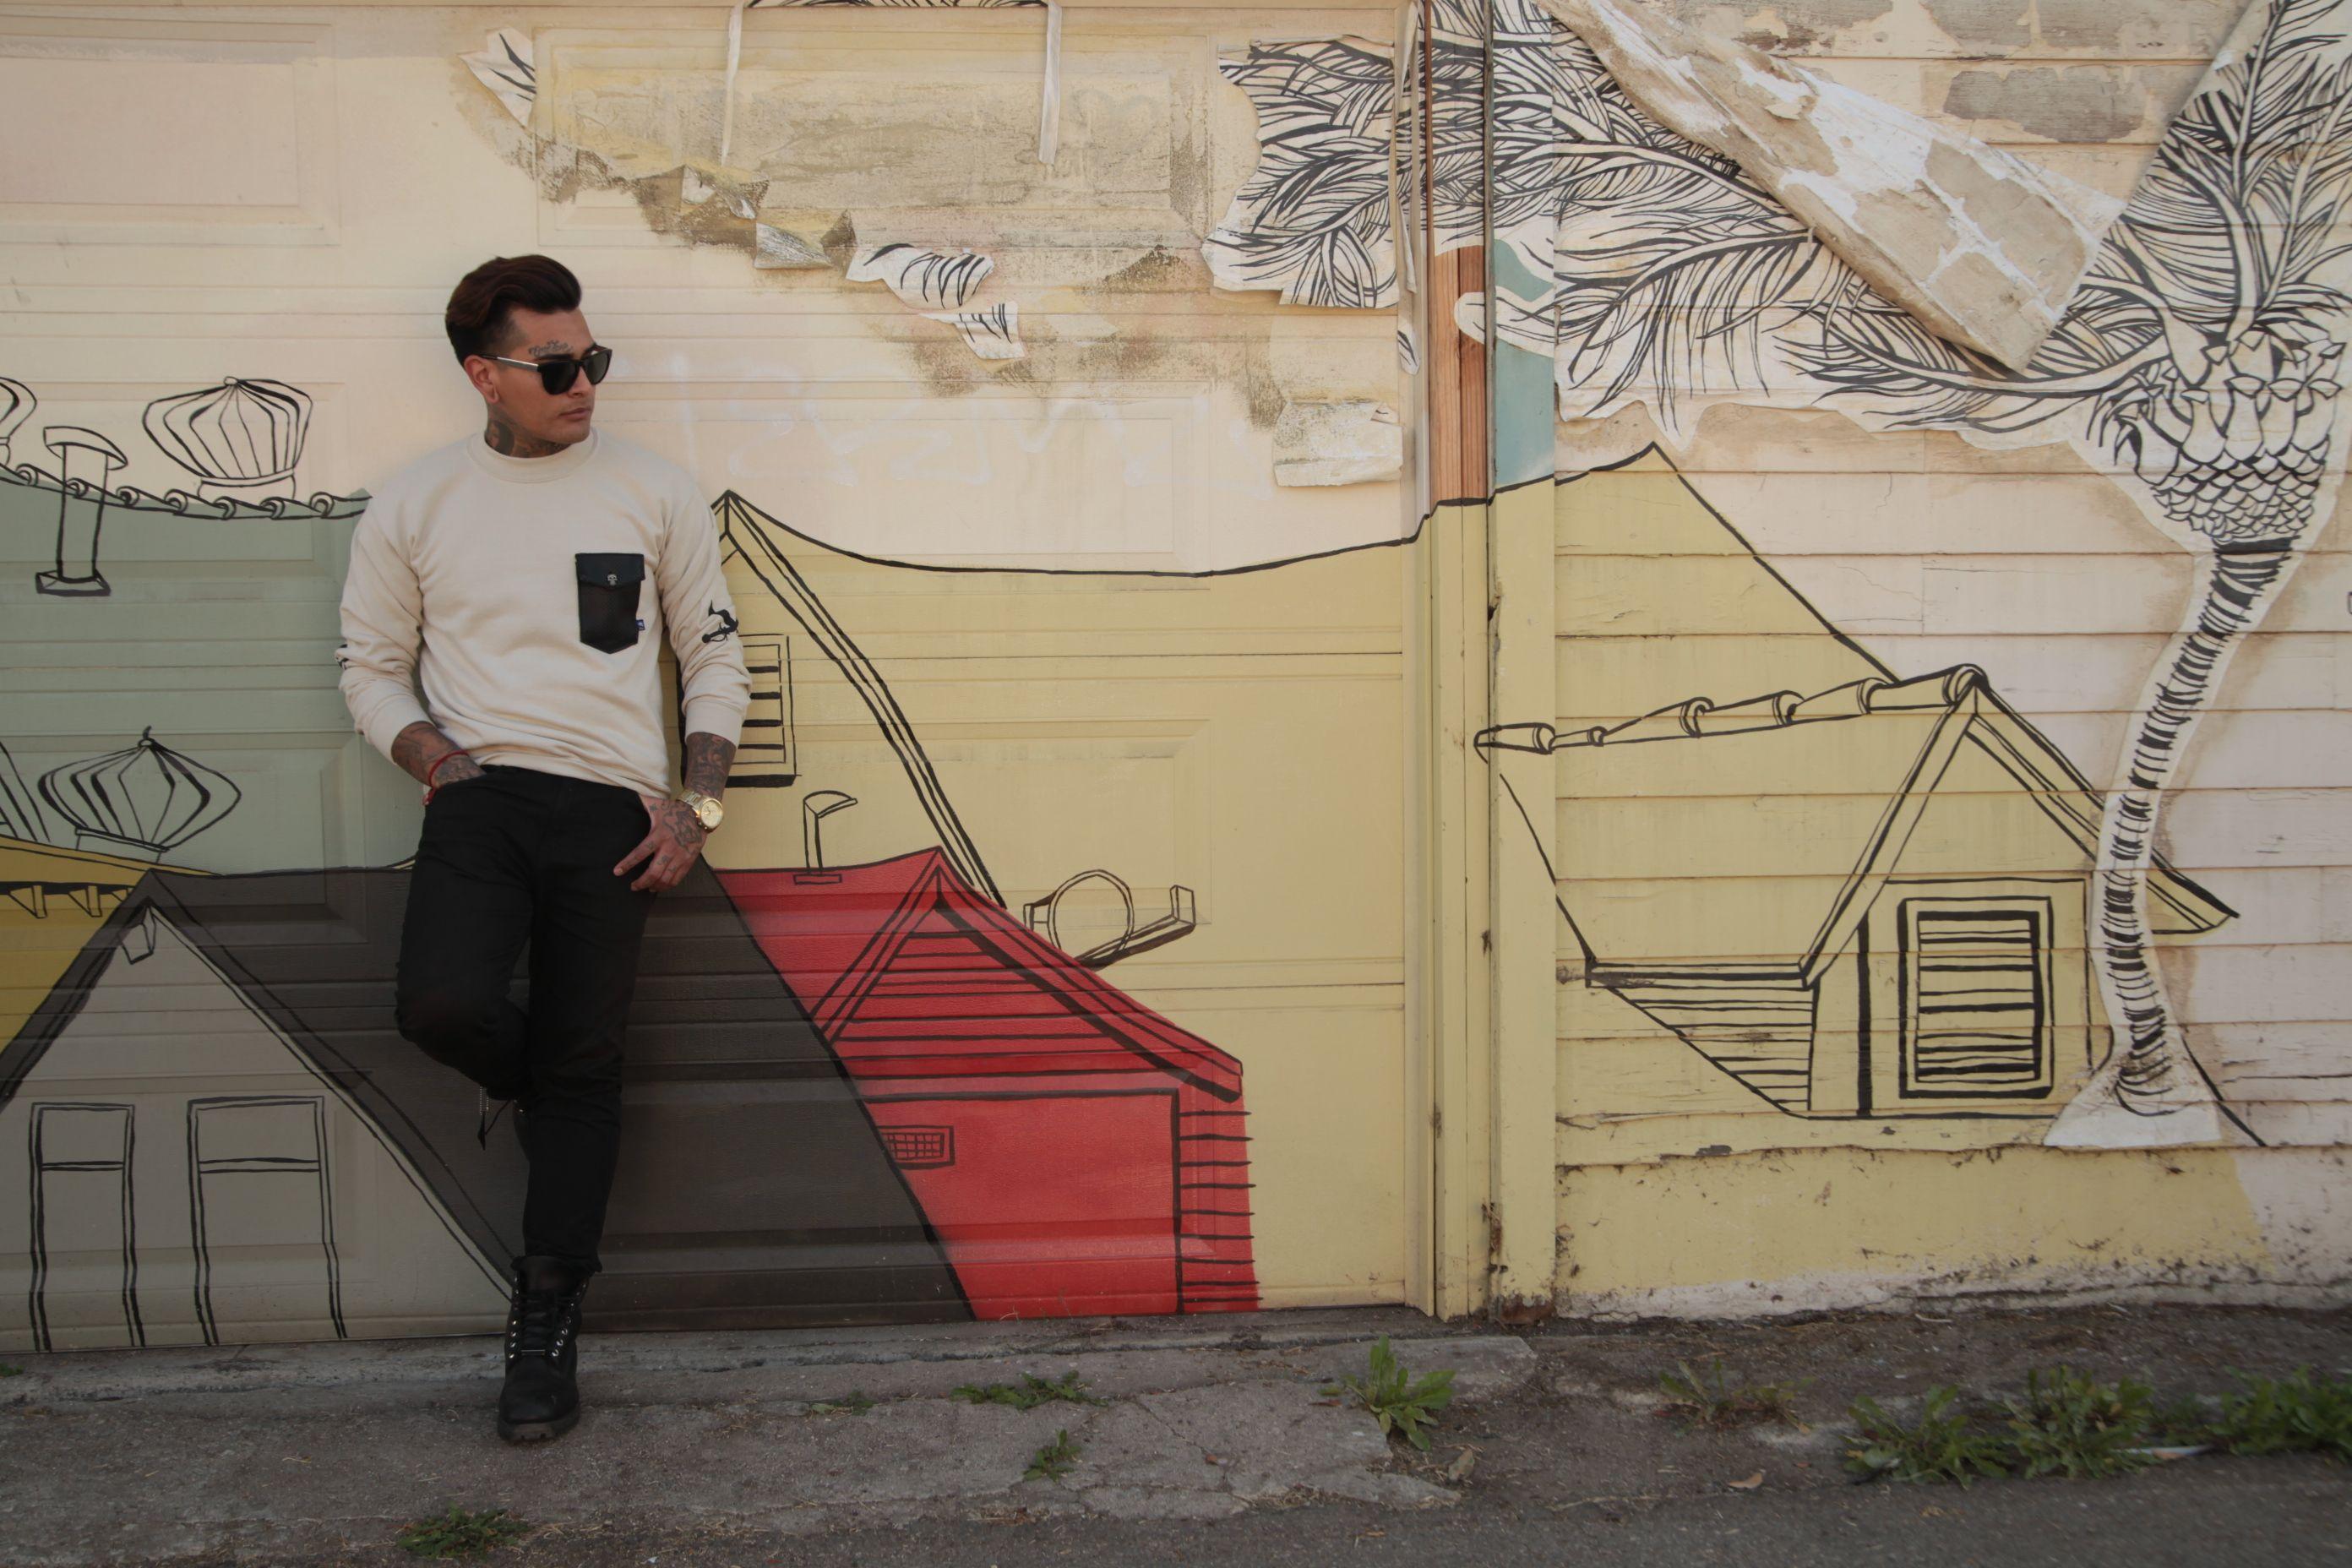 #marillest #tshirt #streetwear #streetfashion #fashion #mensfashion #mens #gift #lifestyle #fashionblog #blogger #mensblog #mensblogger #street #losangeles #losangelesfashion #la #lafashion #sweatshirt #sweater #crewneck